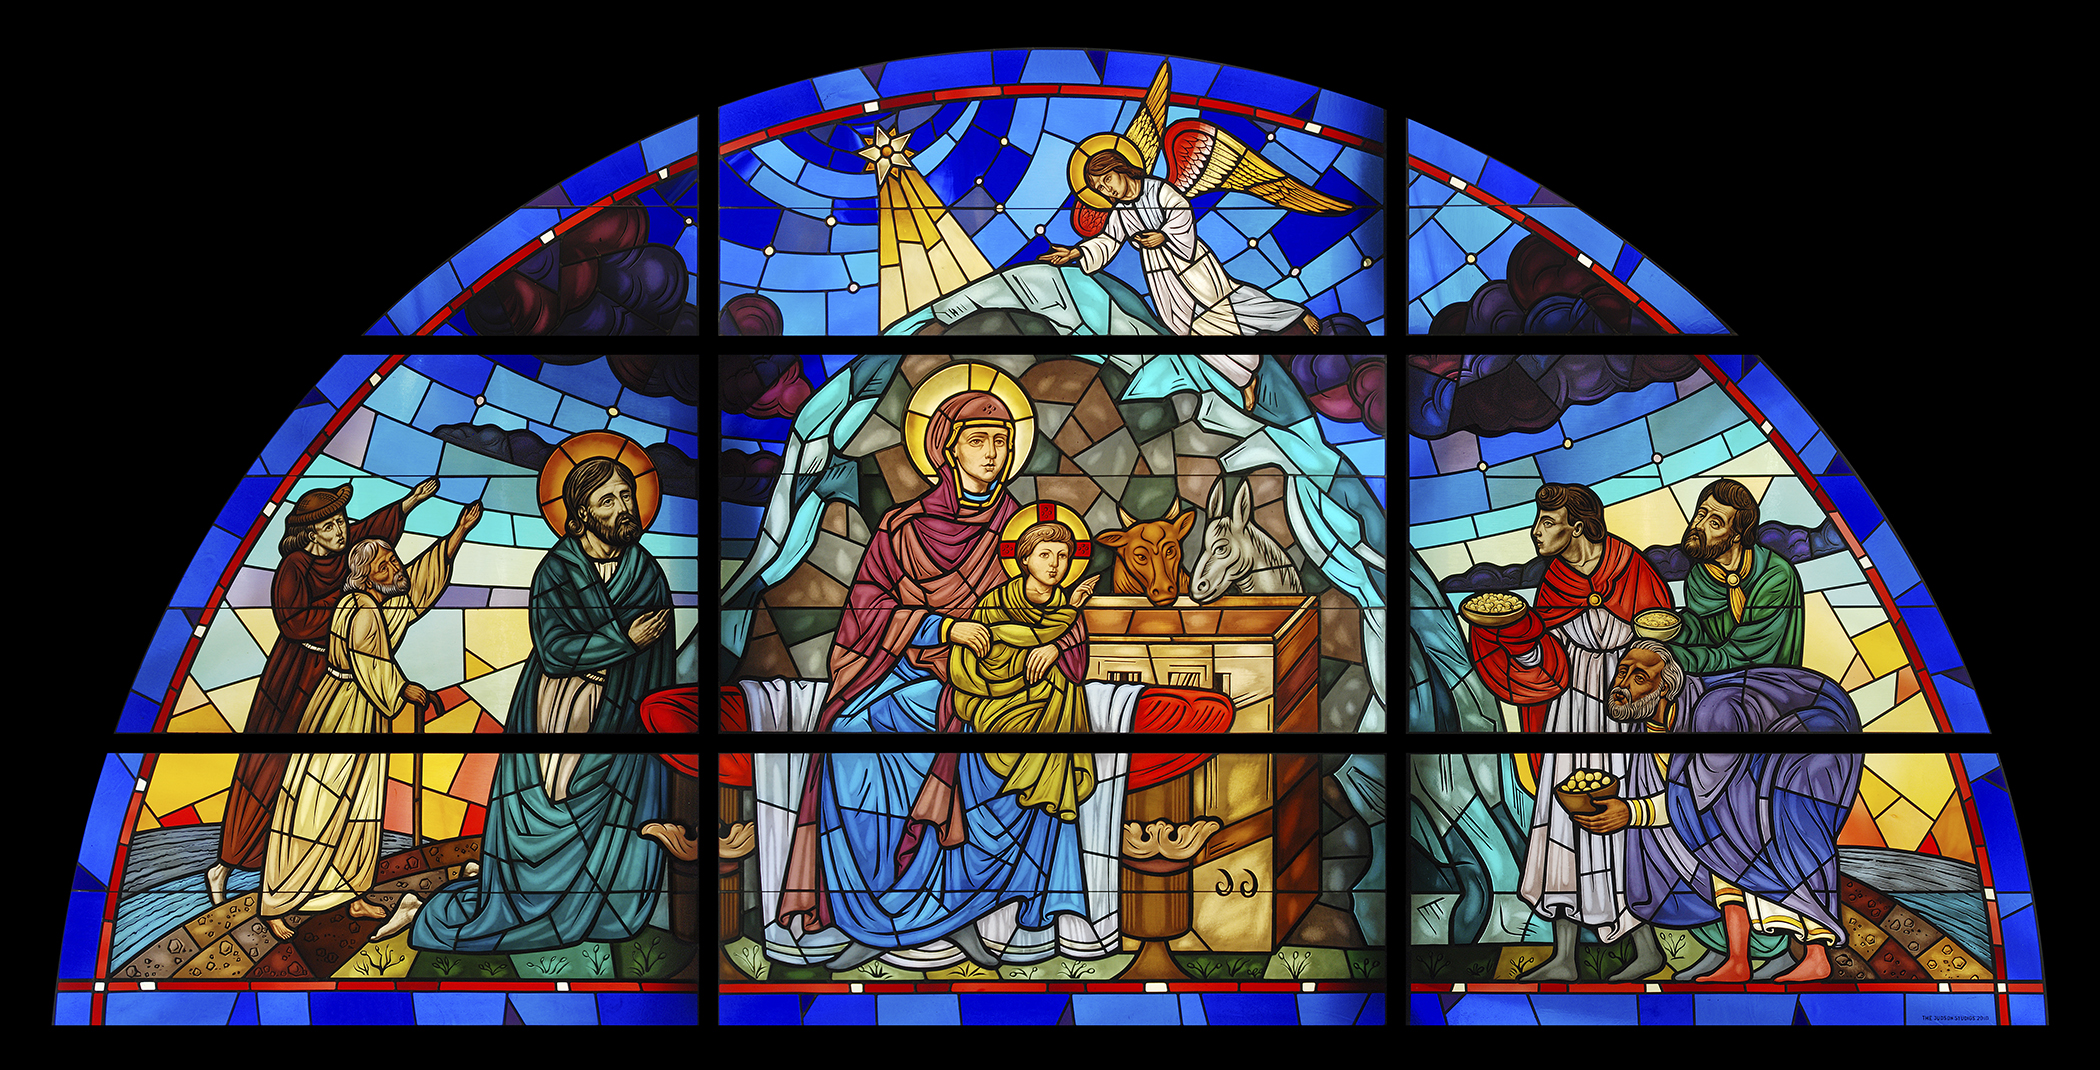 catholic art mary jesus art cathedral church religion wallpaper 2100x1070